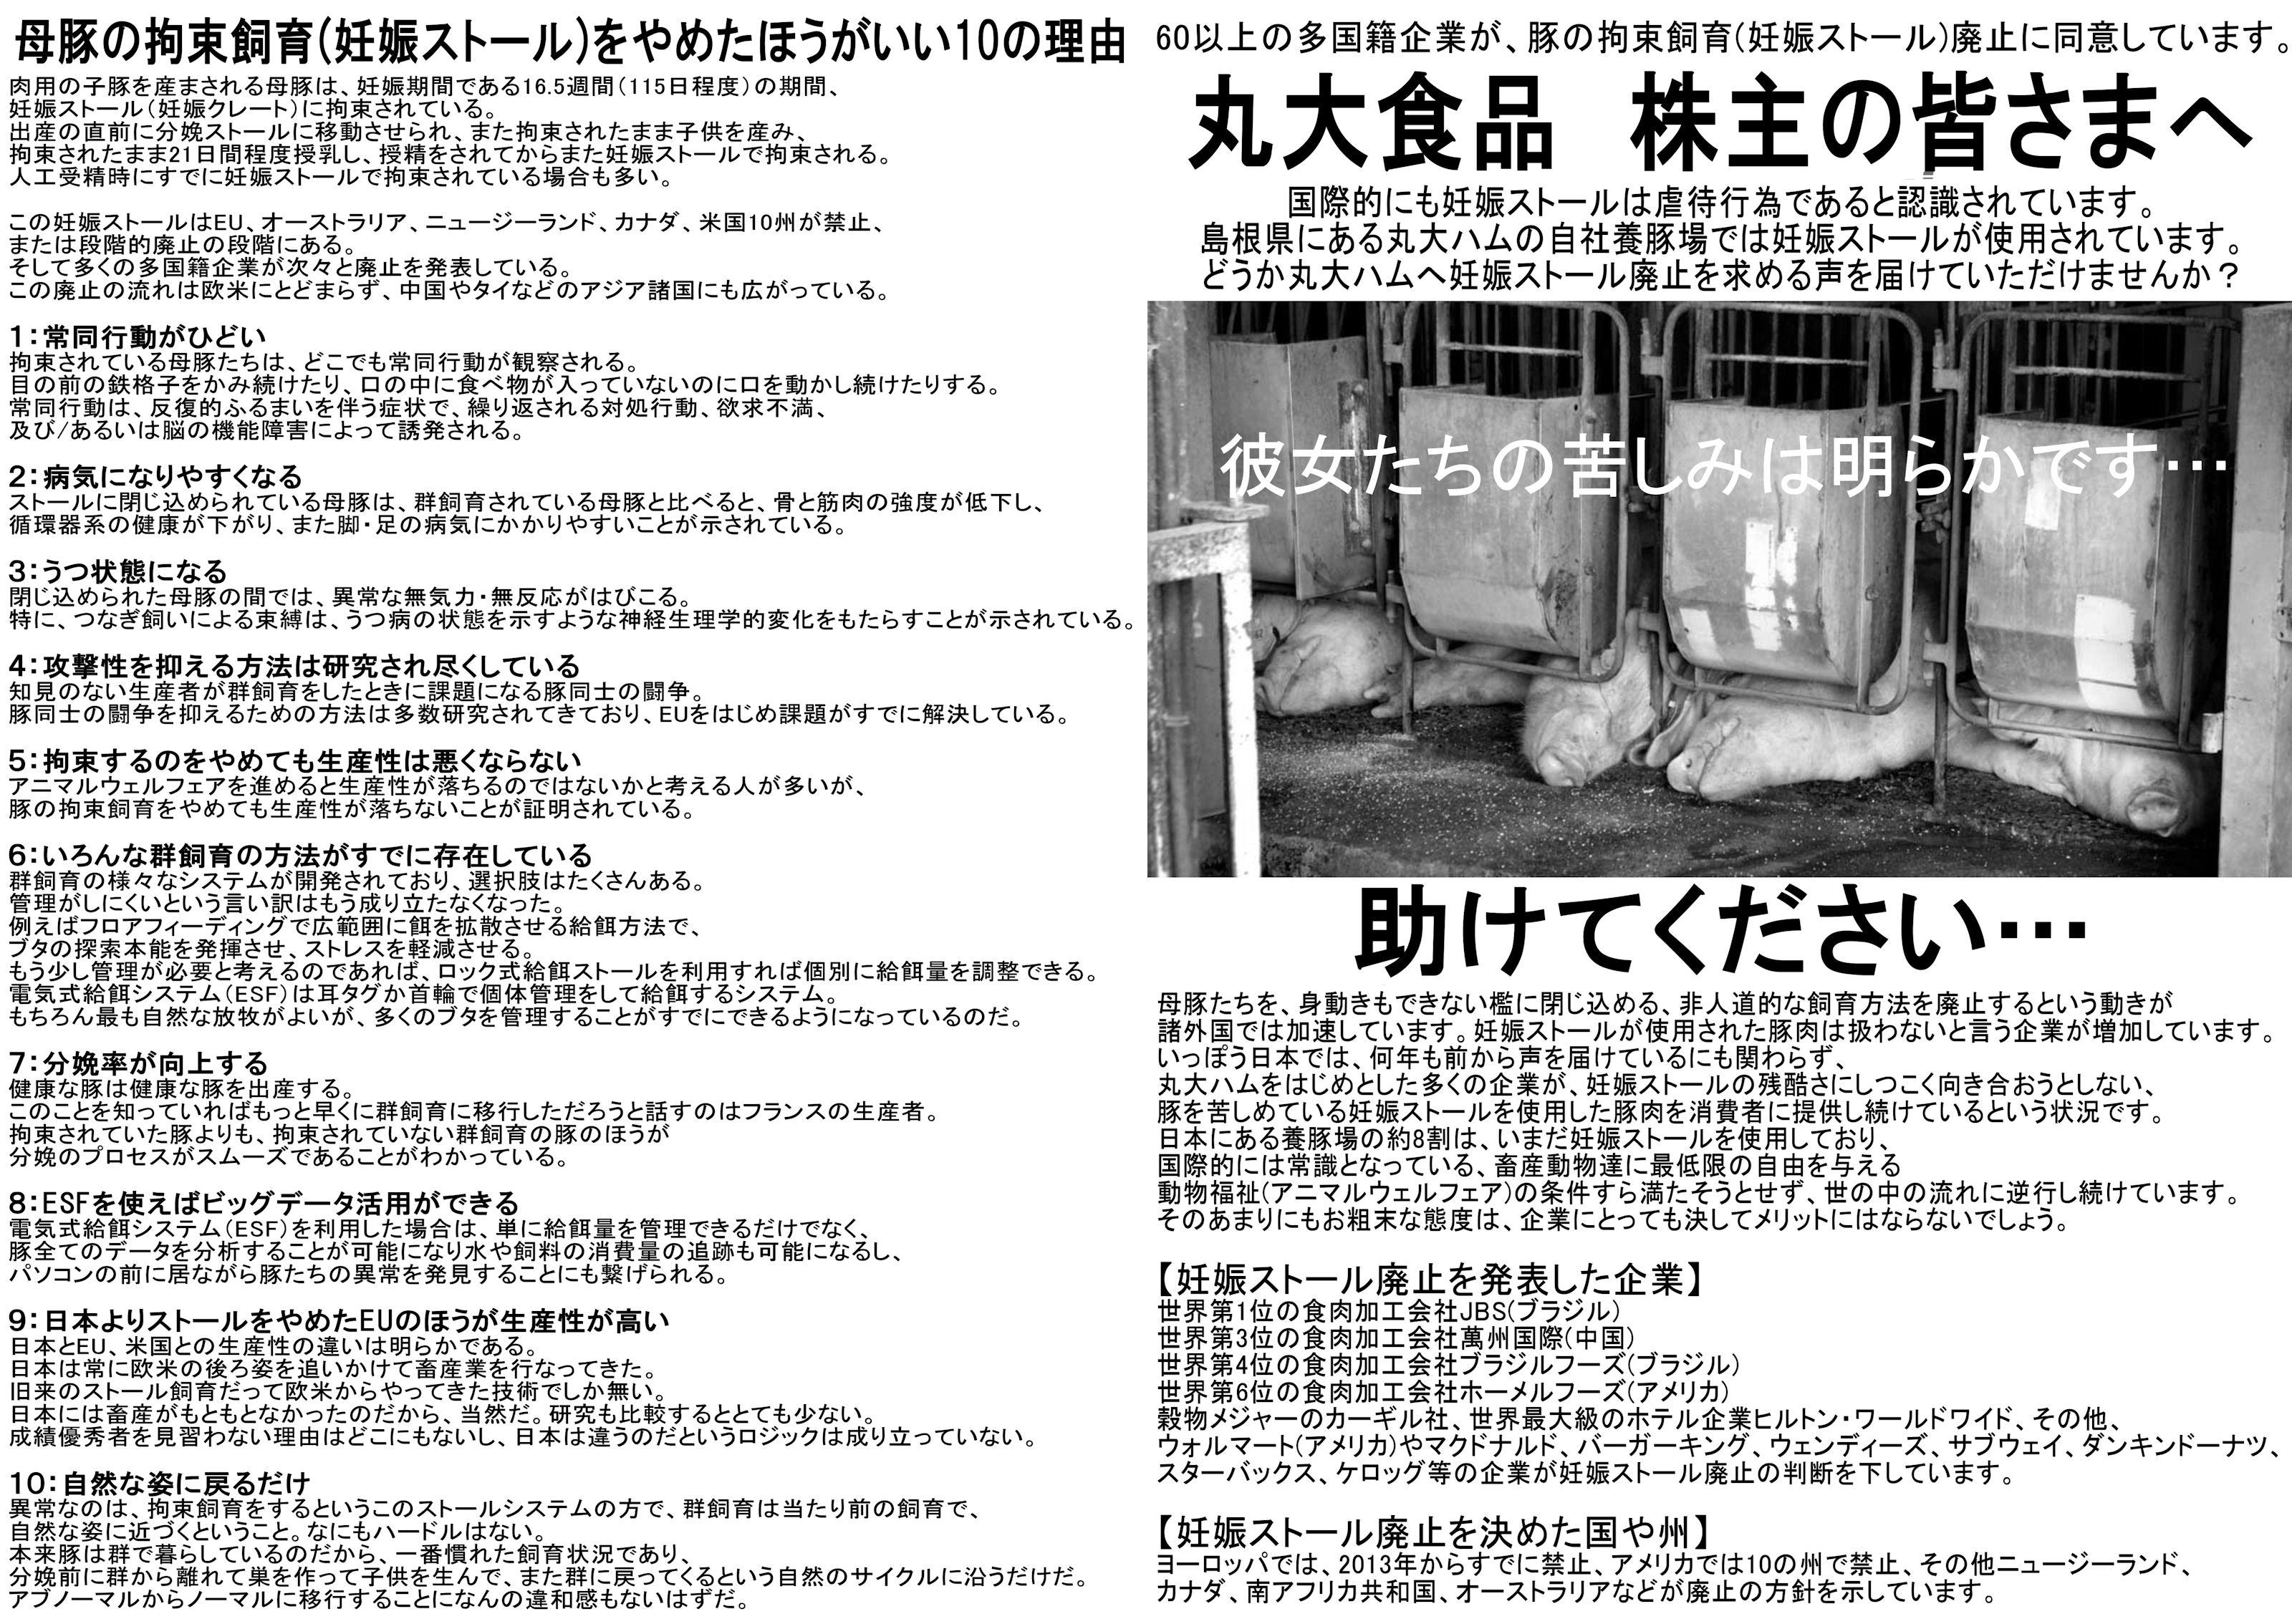 butaorichirashi5.jpg